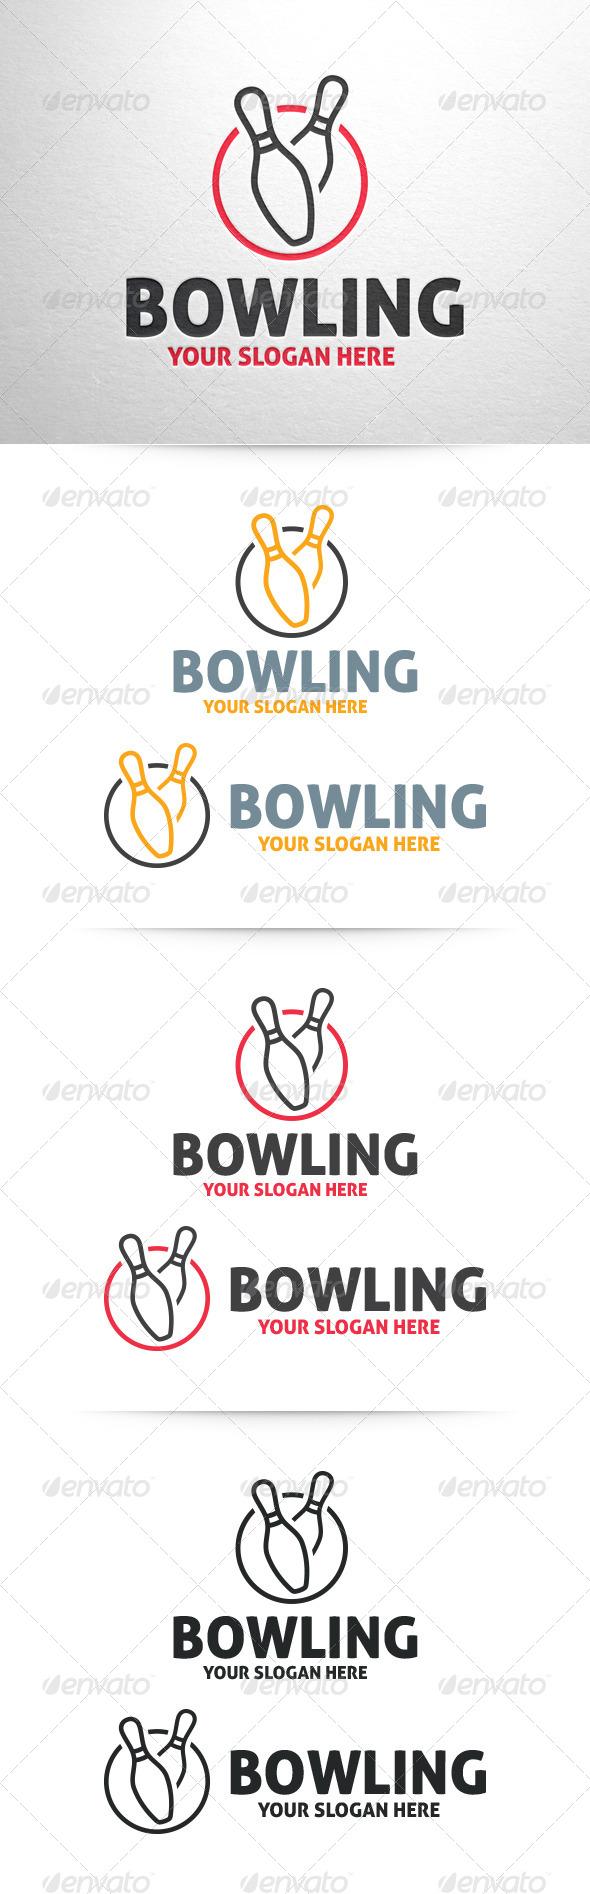 GraphicRiver Bowling Logo Template Part 2 6452384